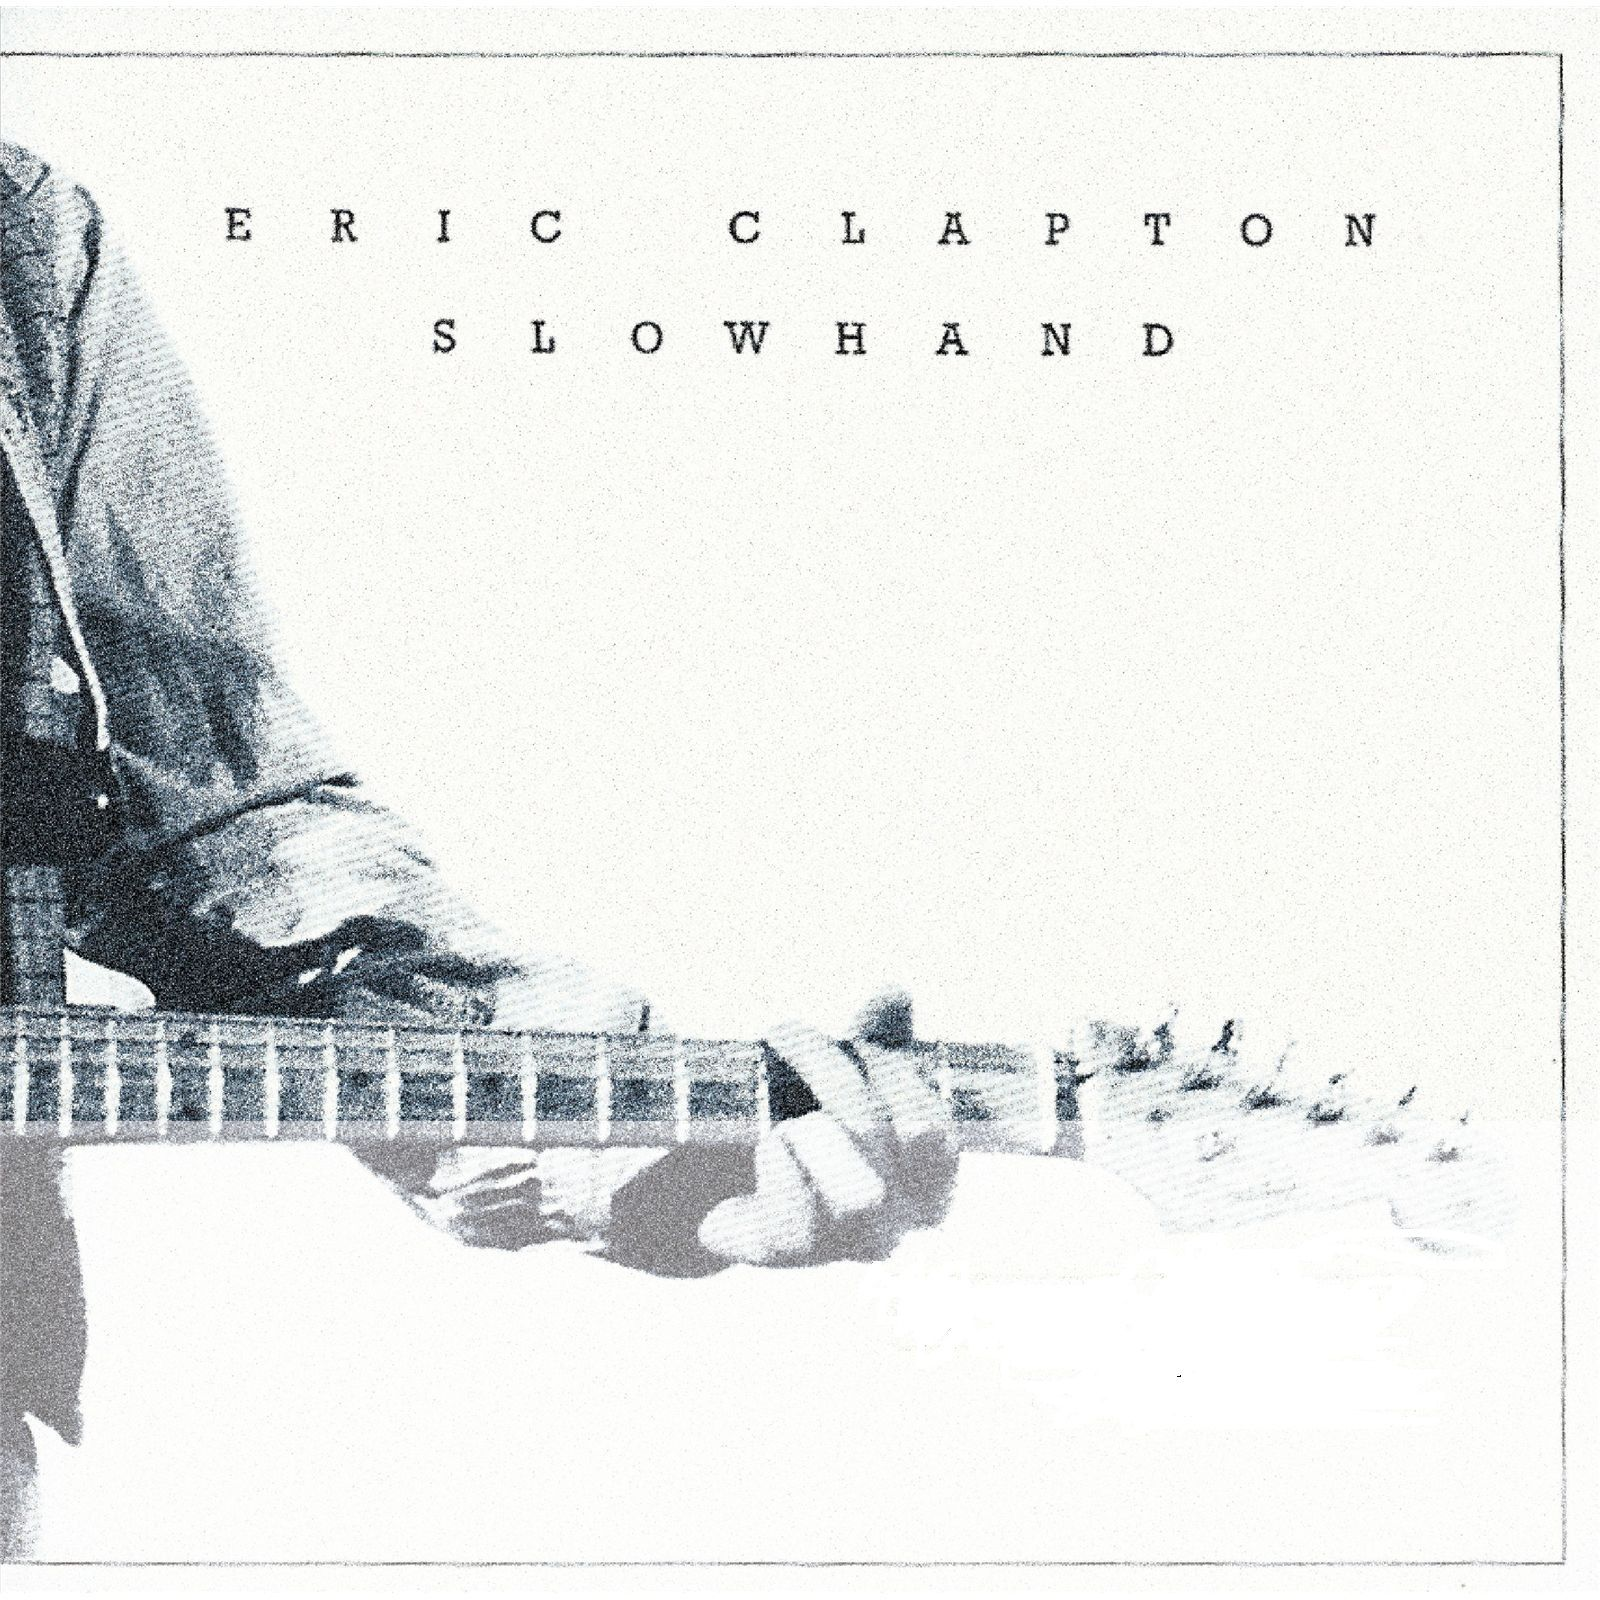 eric clapton slowhand album cover art pinterest